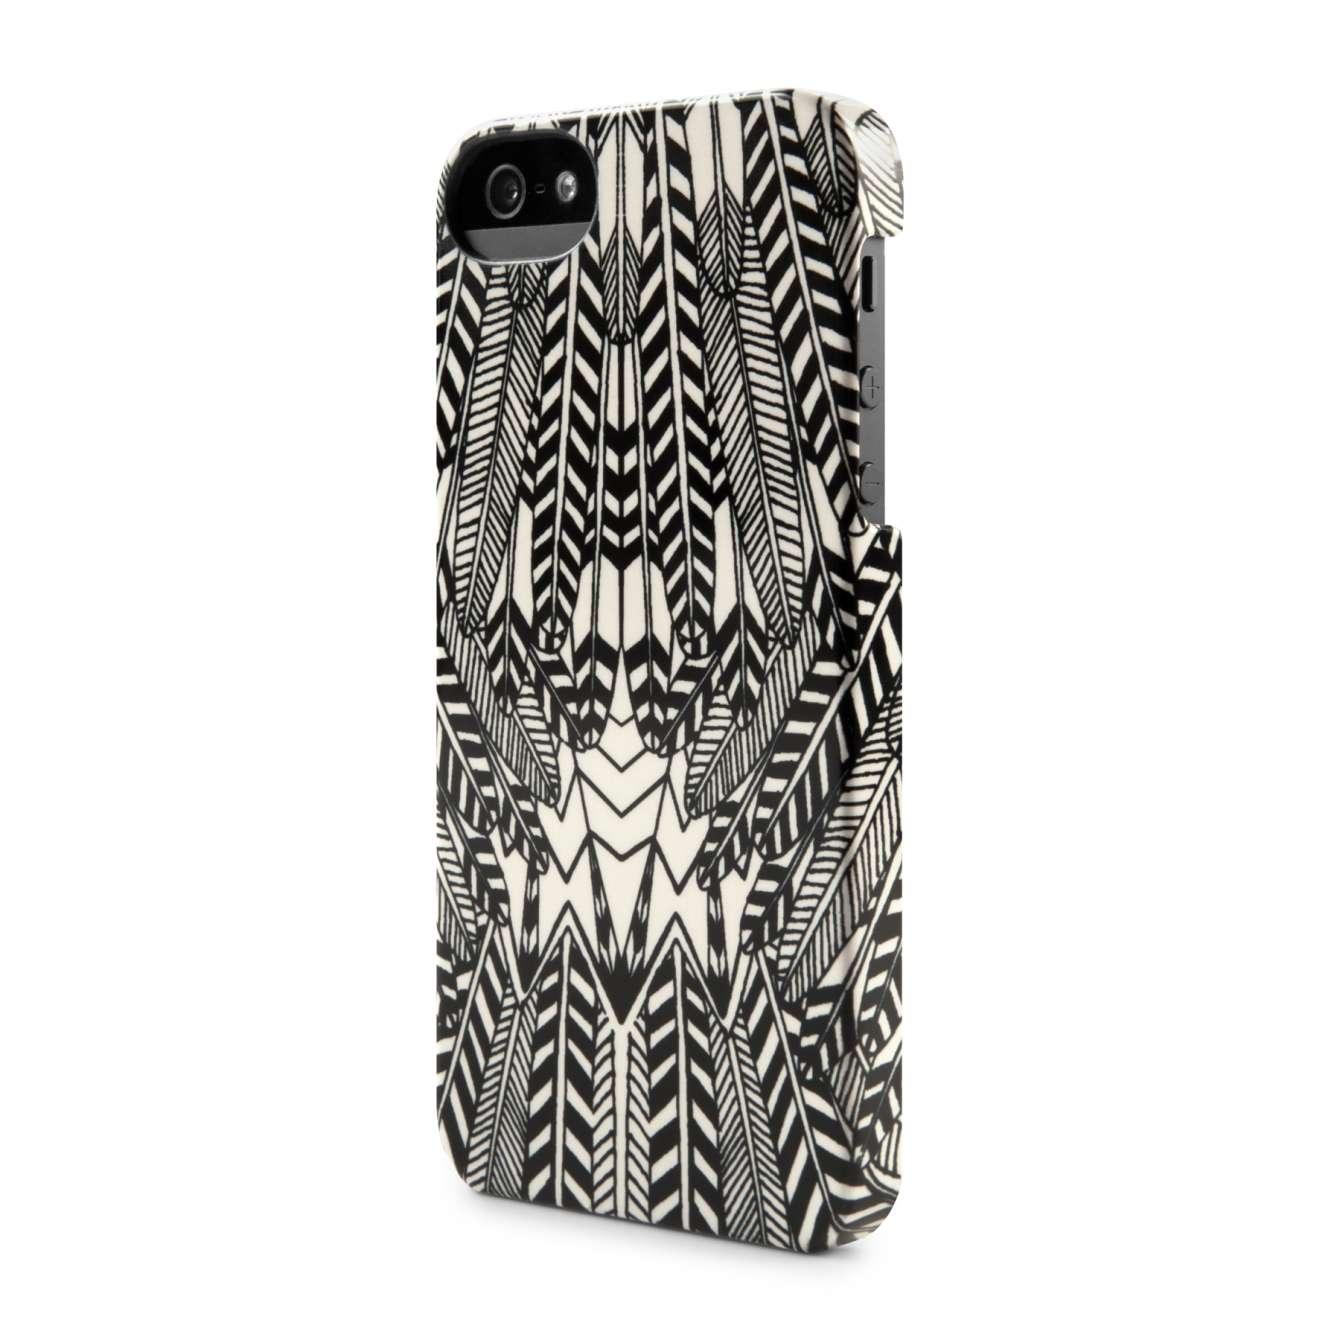 Mara Hoffman x Incase iPhone 5 Snap Cases-4